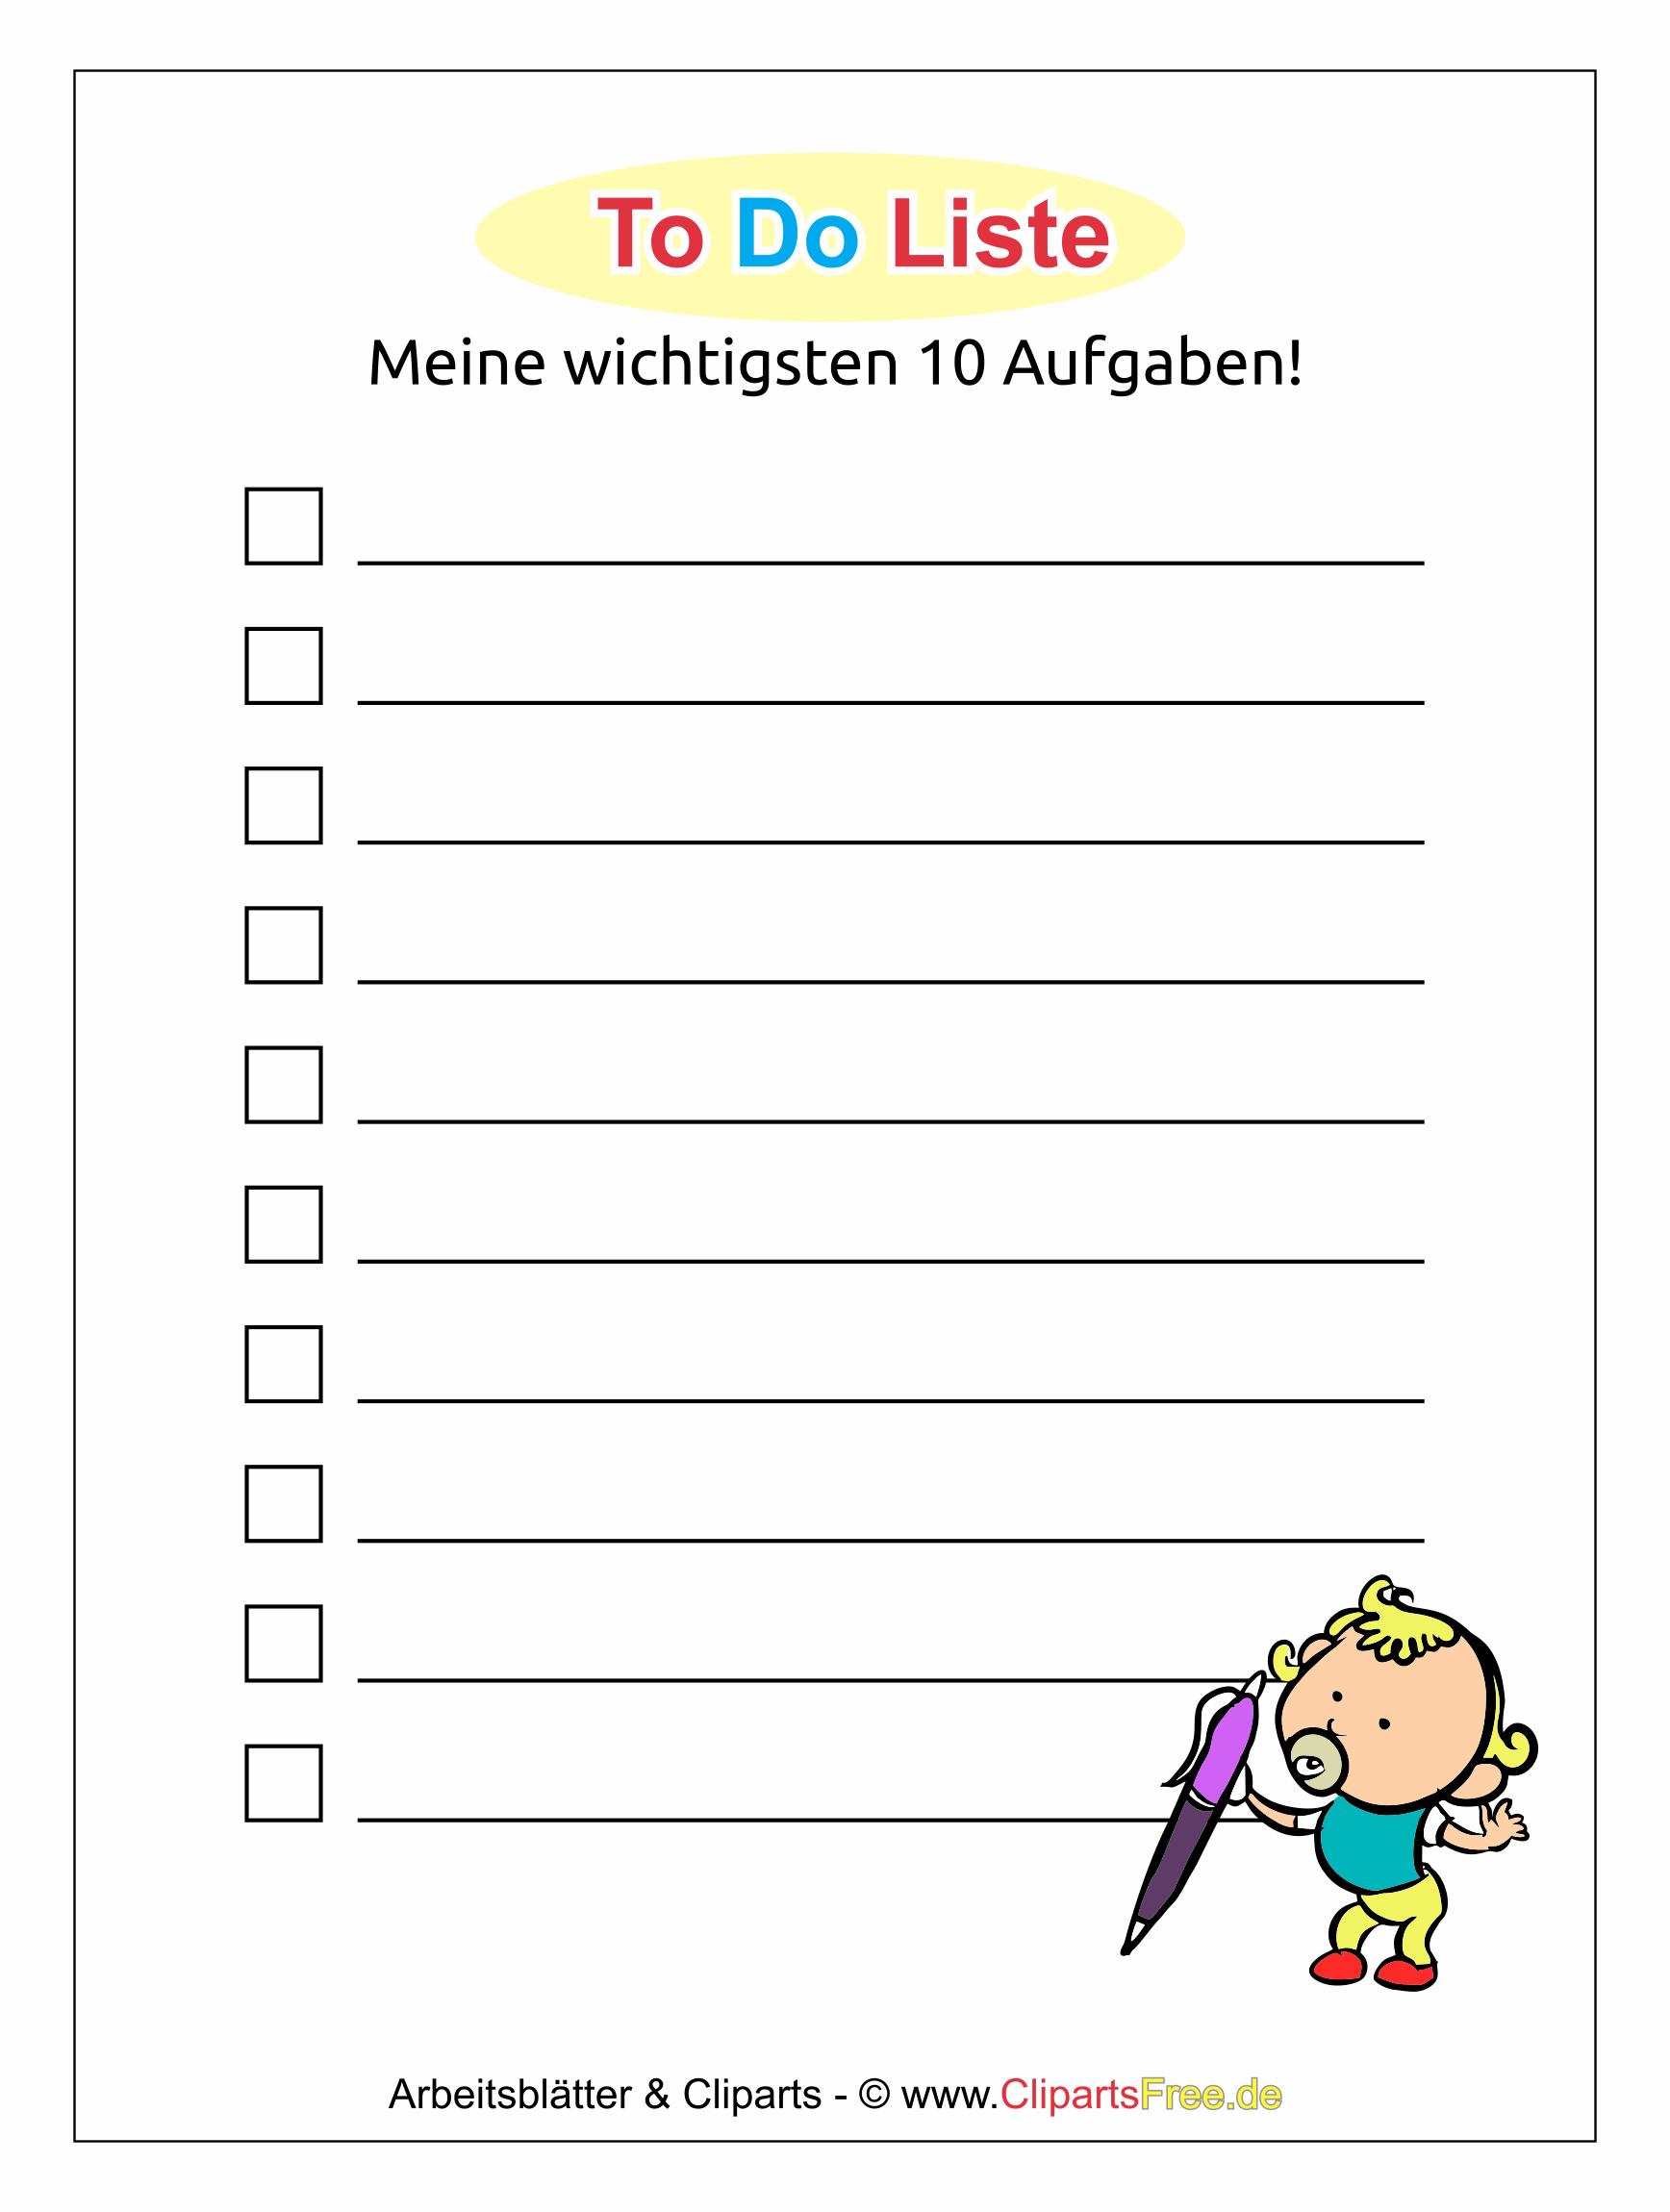 To Do List Template PDF